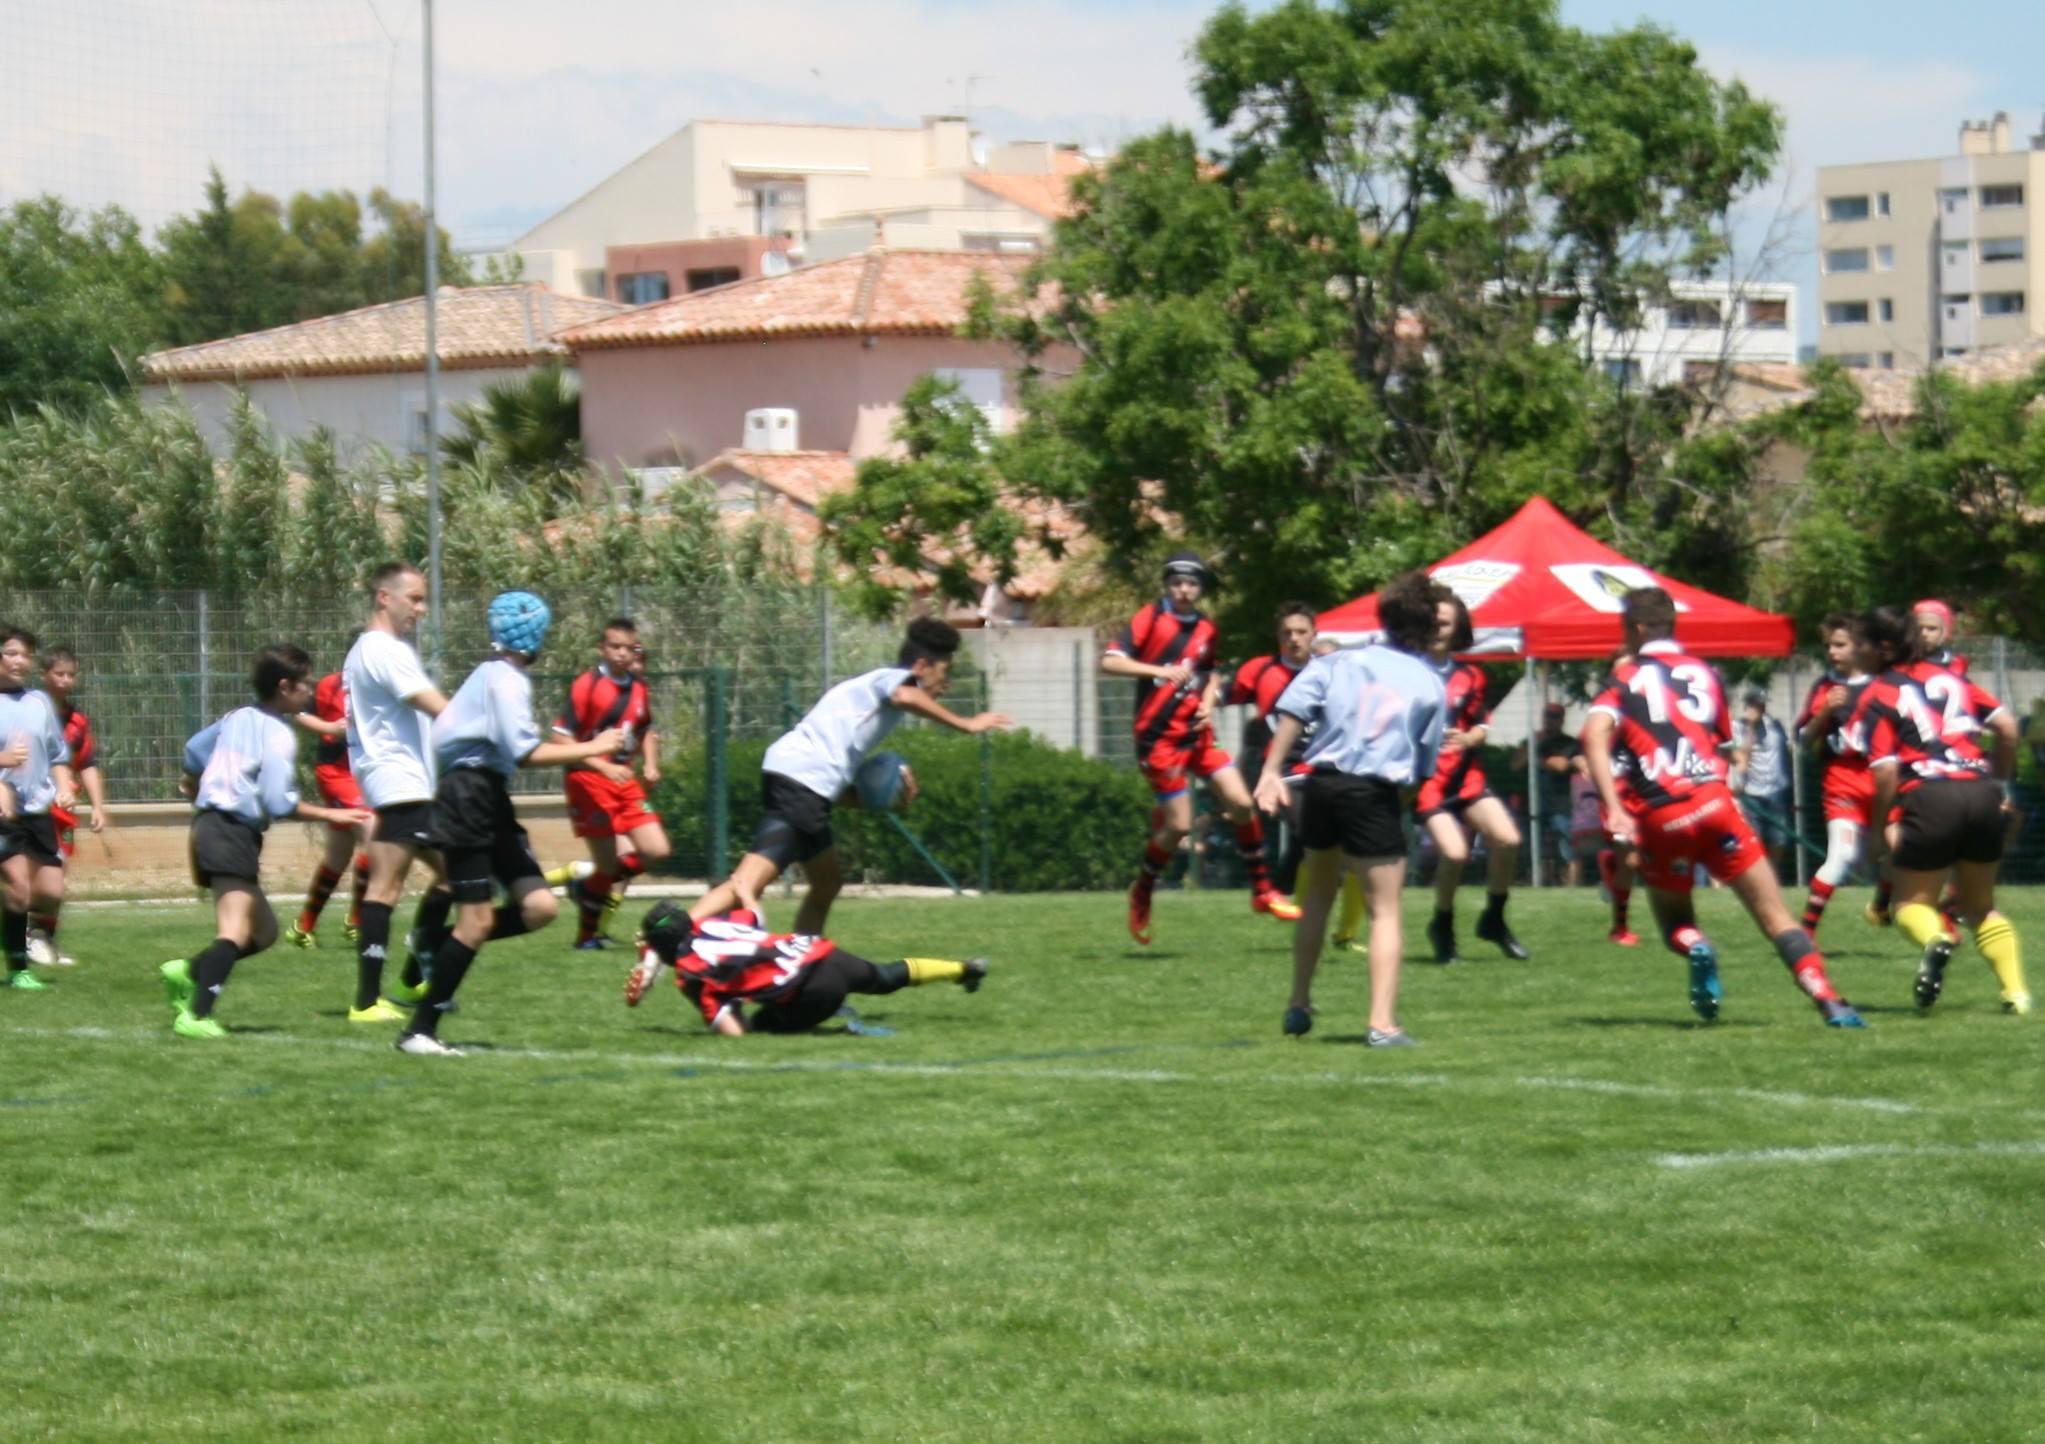 https://scg-rugby.com/wp-content/uploads/2018/05/33096389_1402684489876838_6247398719398871040_o.jpg